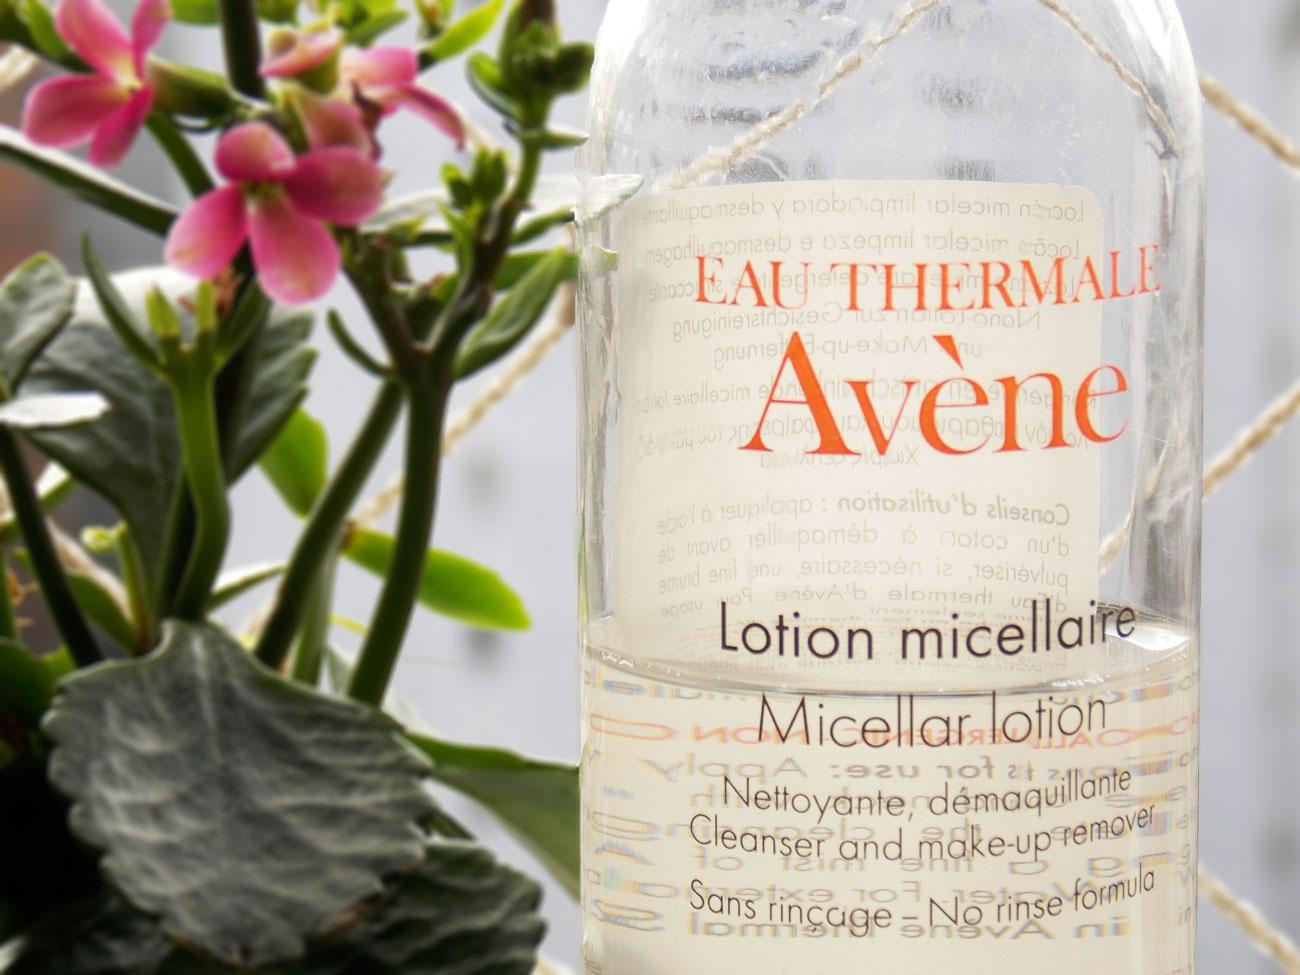 TulipsandHeels-Avène-micellar-lotionr-review